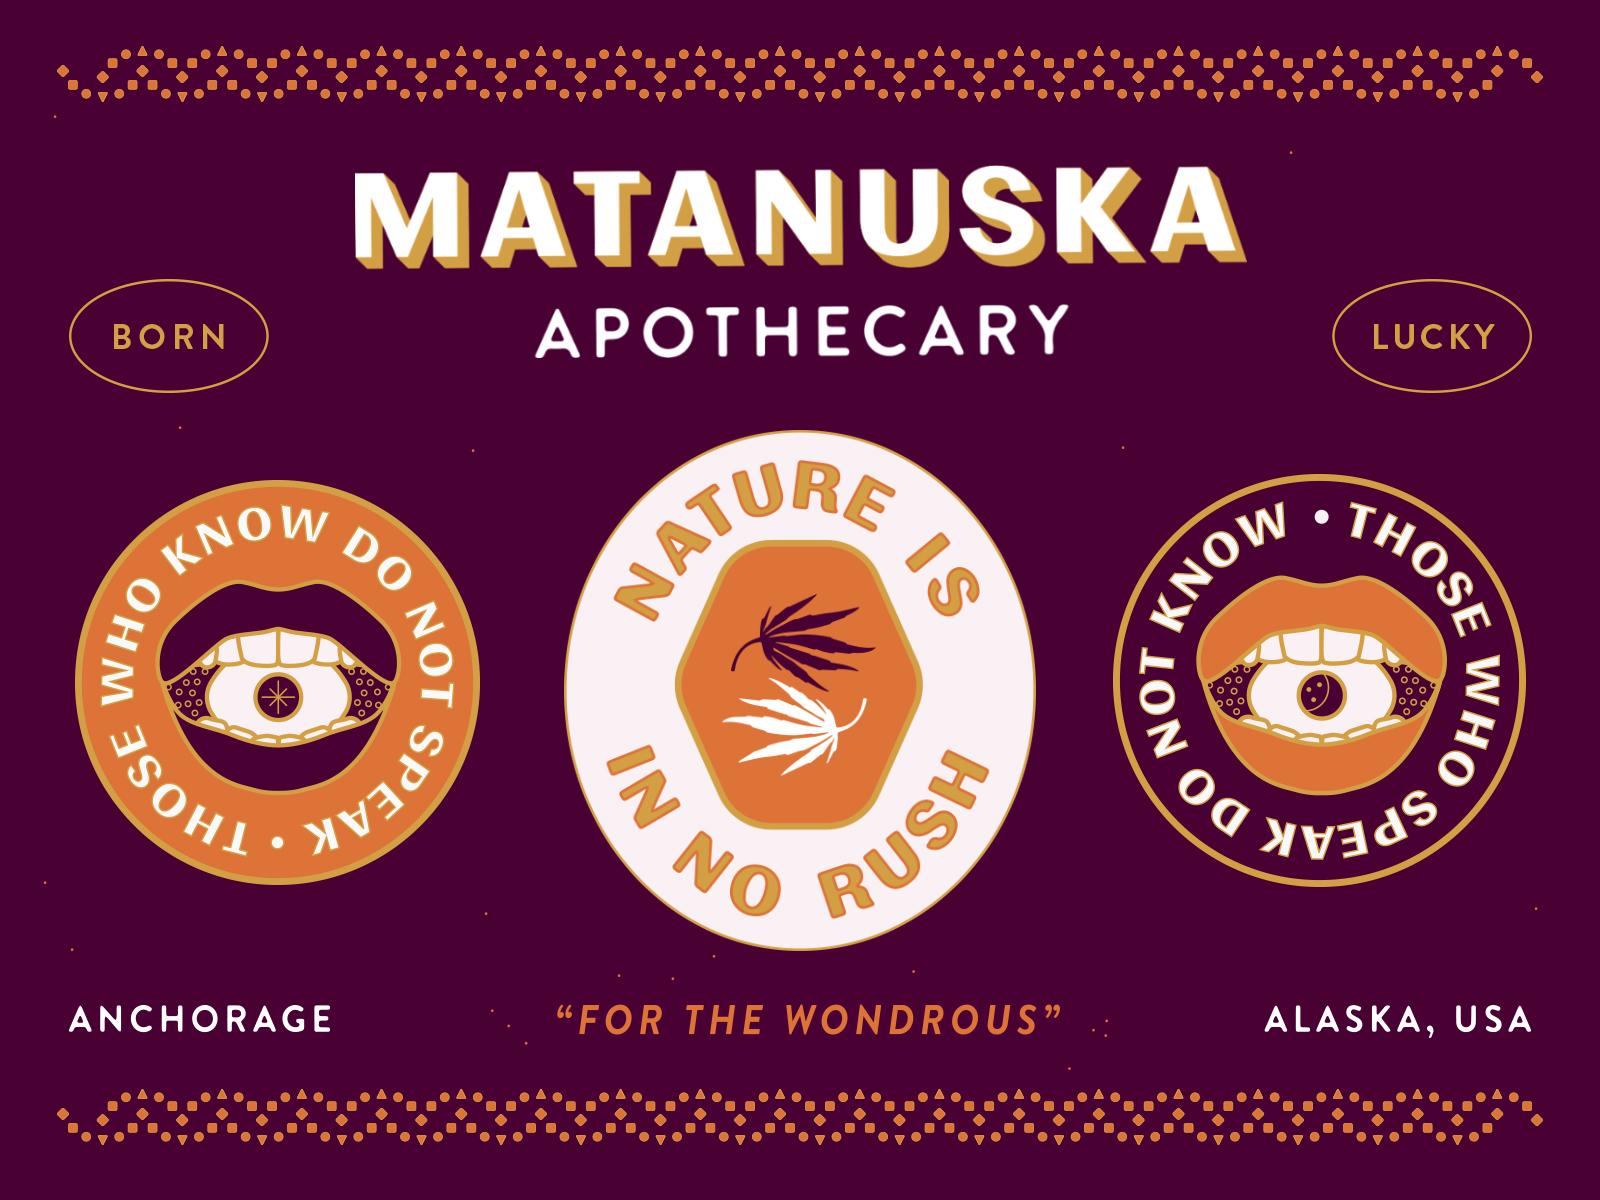 Matanuska a a aa adrib